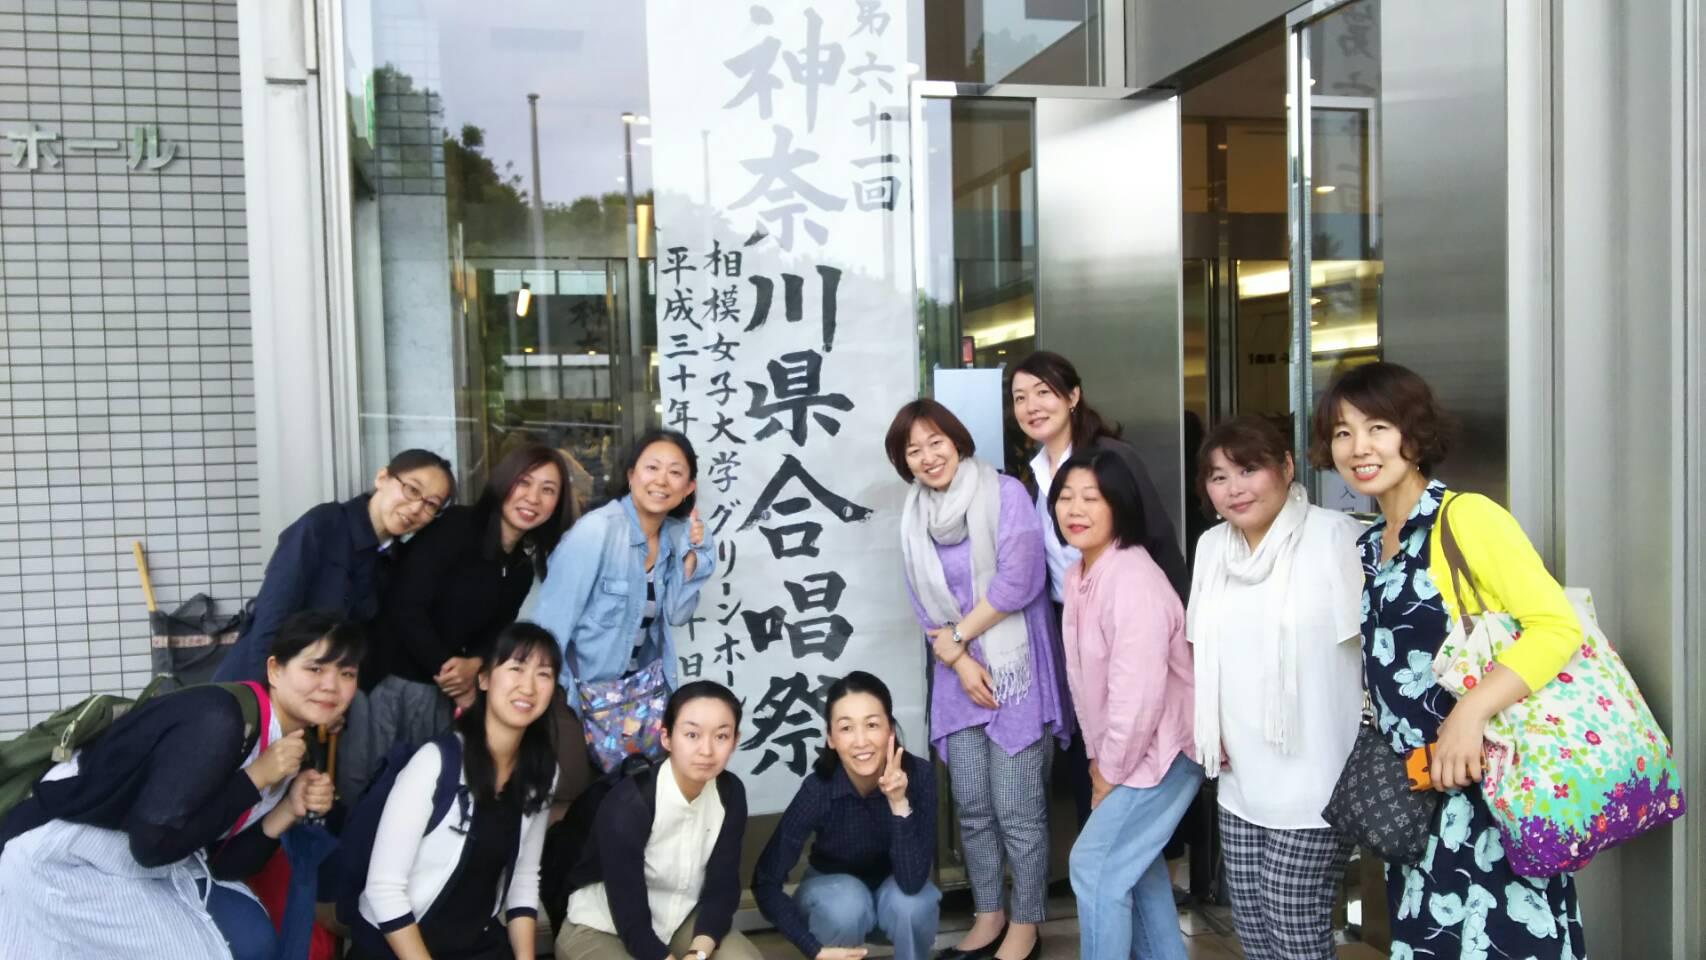 2018年神奈川県合唱祭 今年は相模原